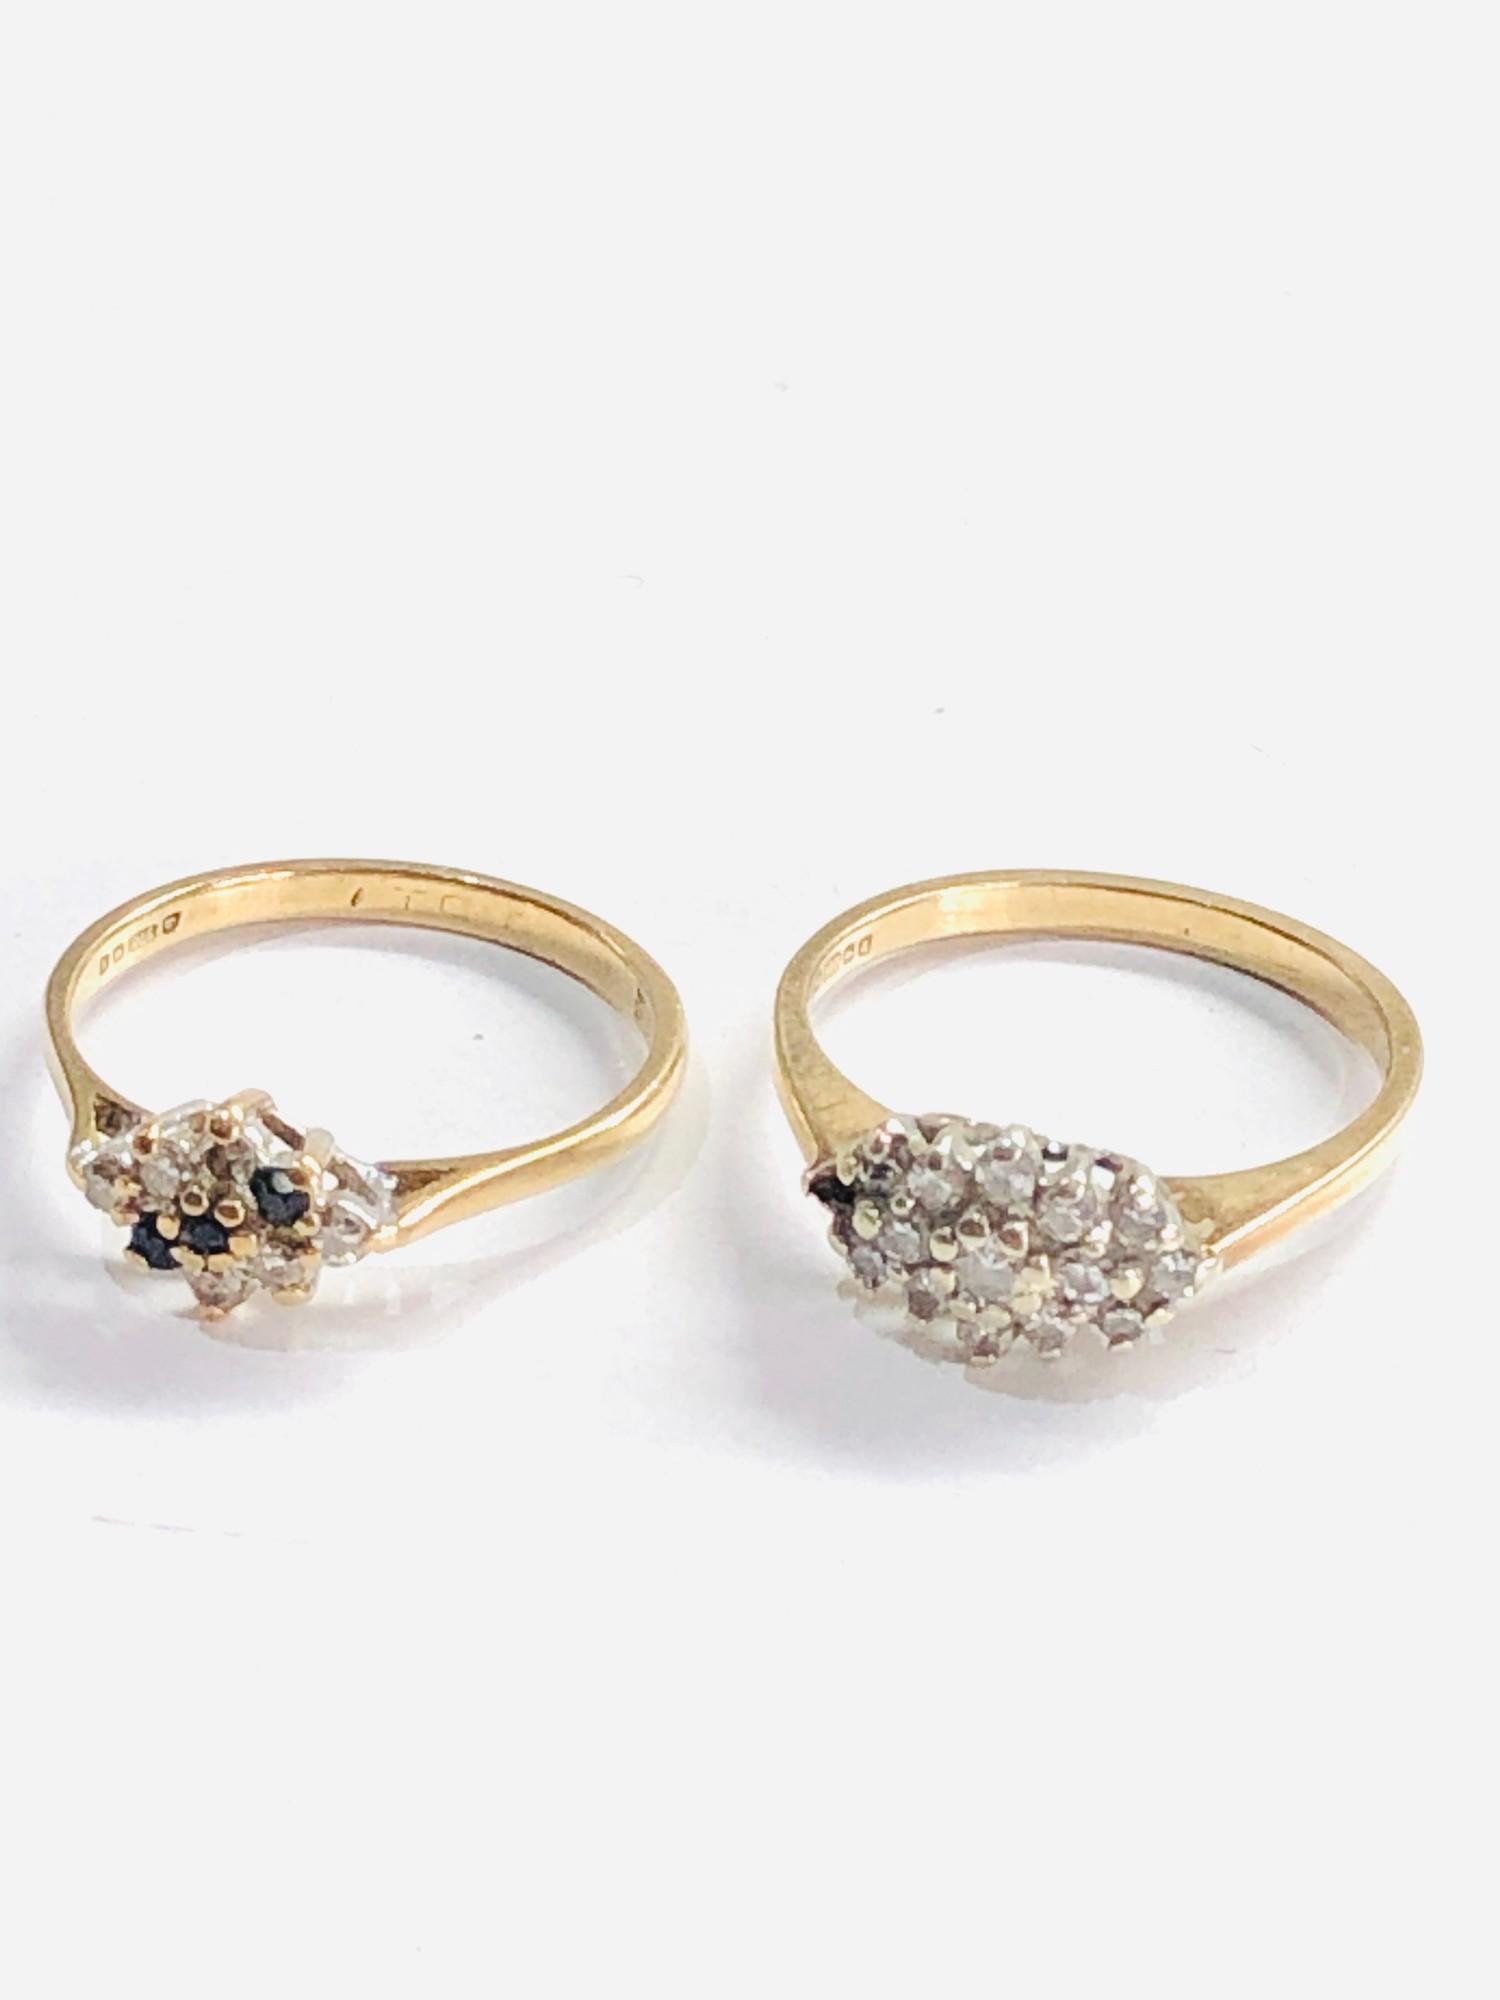 2 x 9ct gold diamond rings missing 1 diamond 3.7g - Image 2 of 3